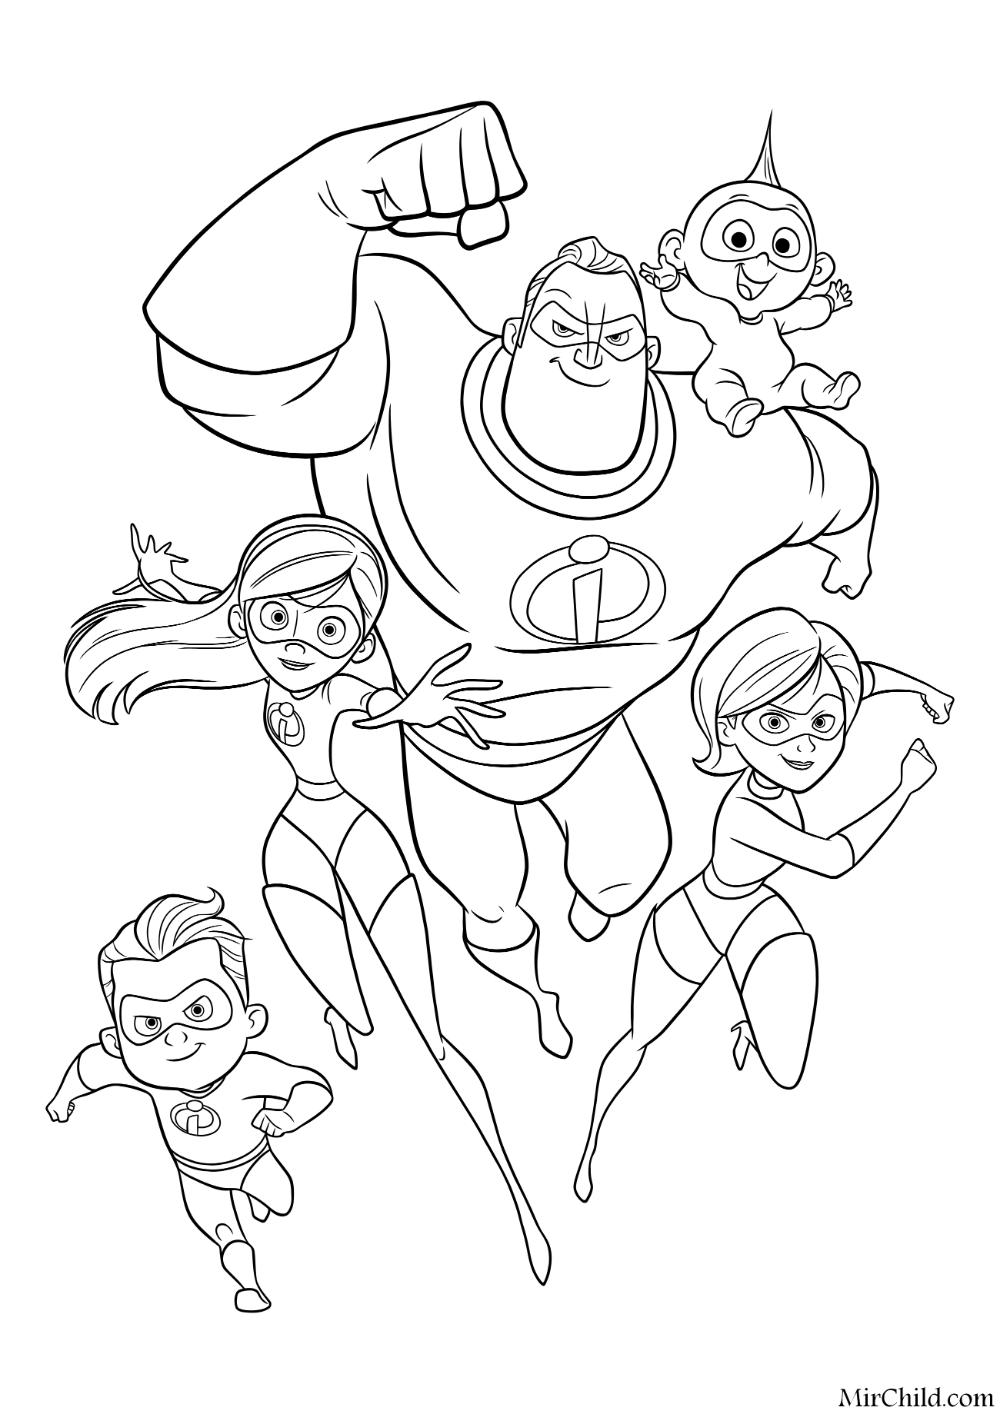 Supersemejka Raskraska Poisk V Google Disney Character Drawings Family Coloring Pages Disney Coloring Pages